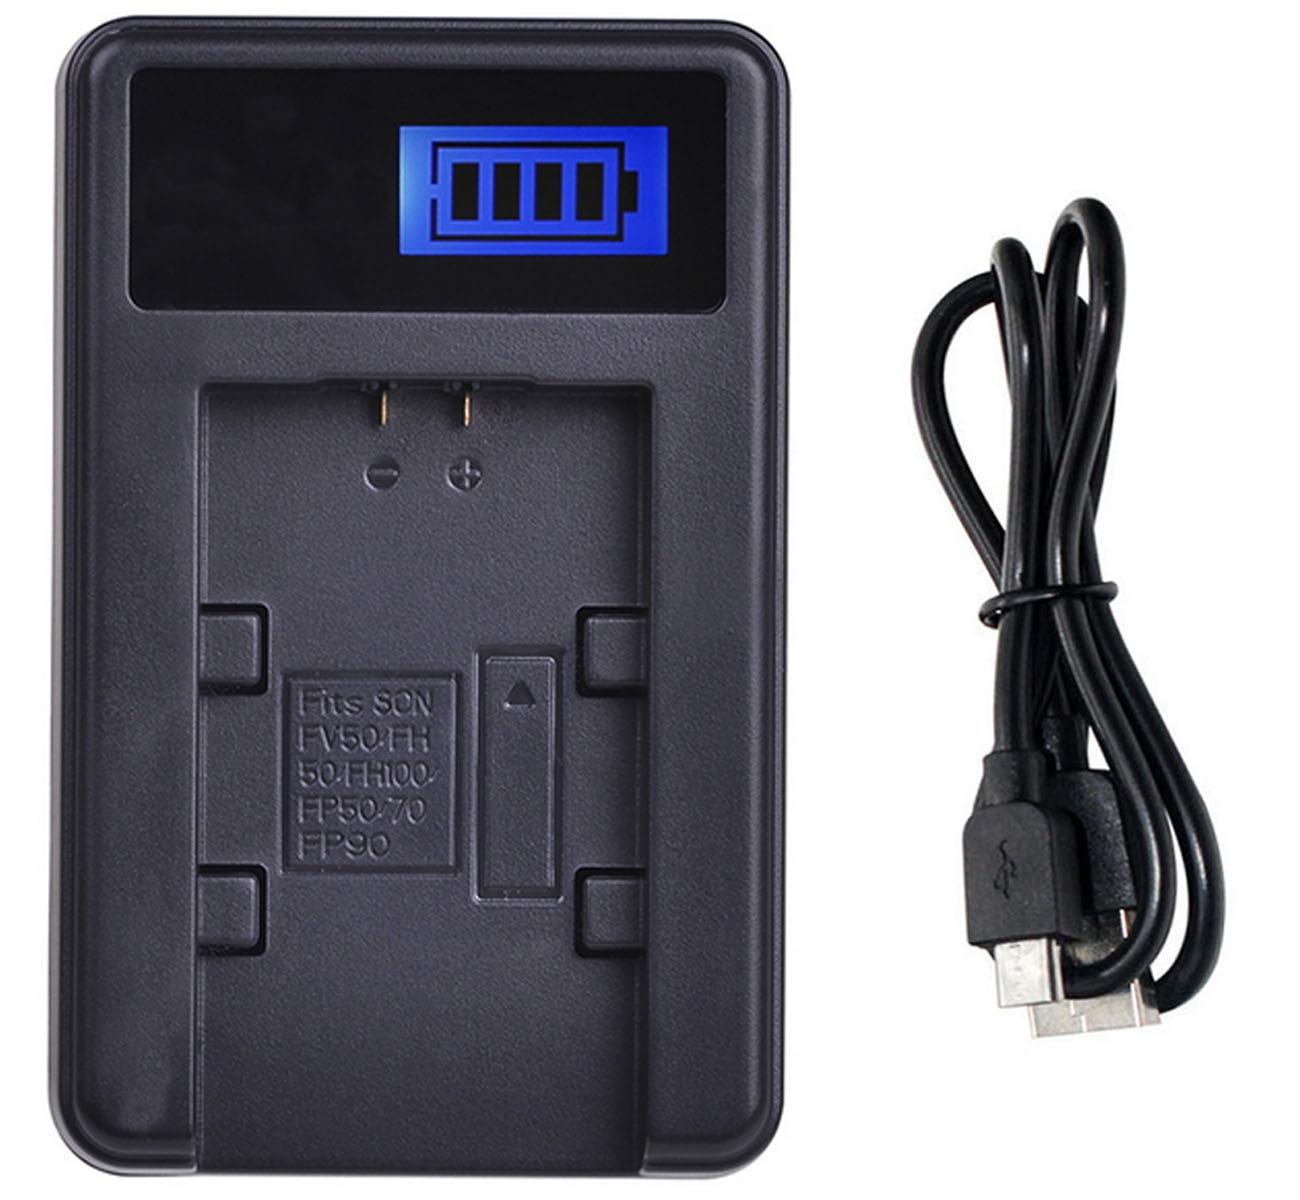 Cargador de batería USB LCD para videocámara Sony HDR-XR100E, HDR-XR105E, HDR-XR106E, HDR-XR150E,...